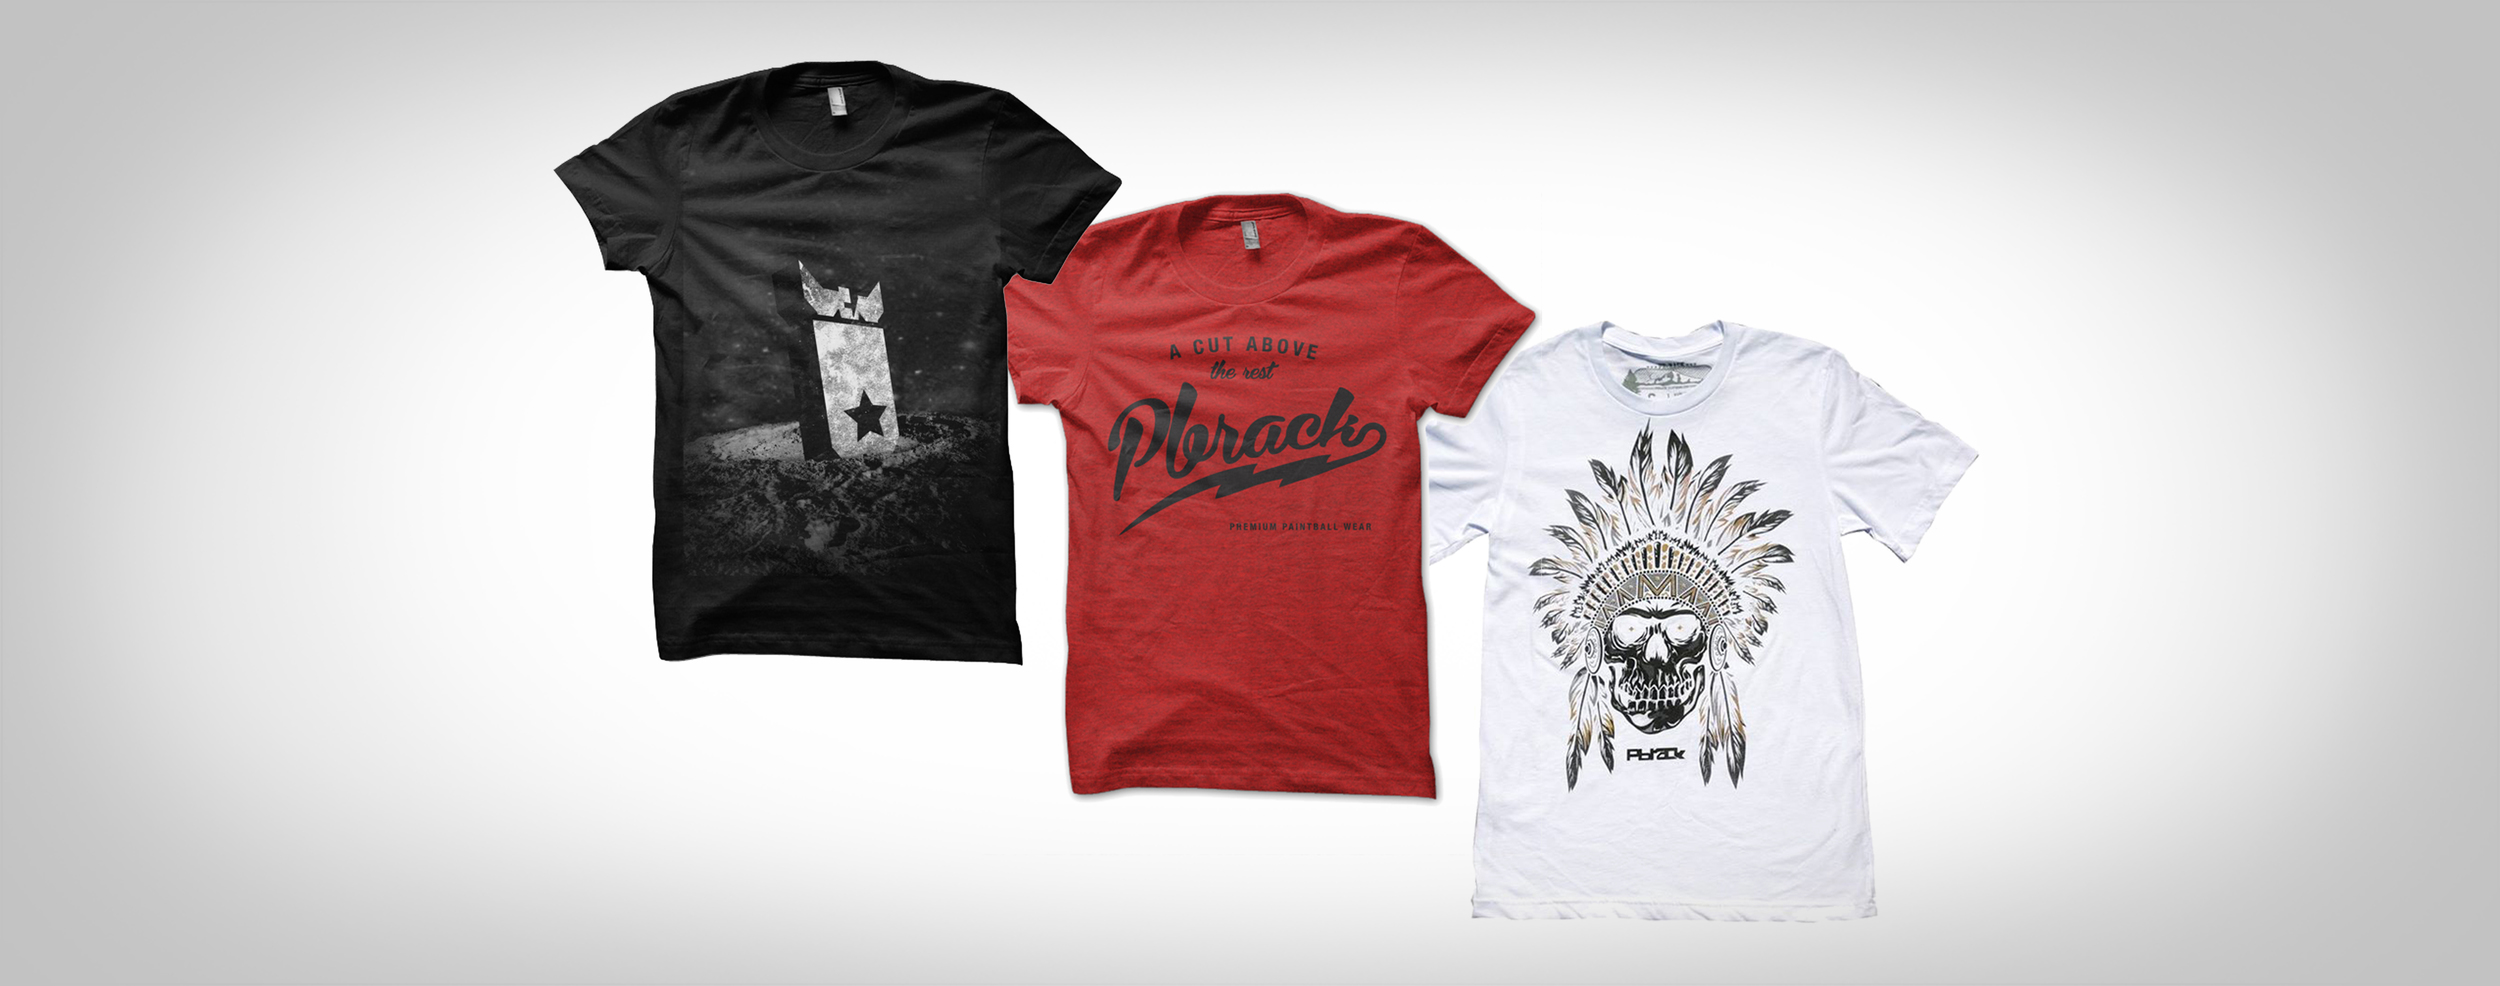 shirts-portfolio.jpg